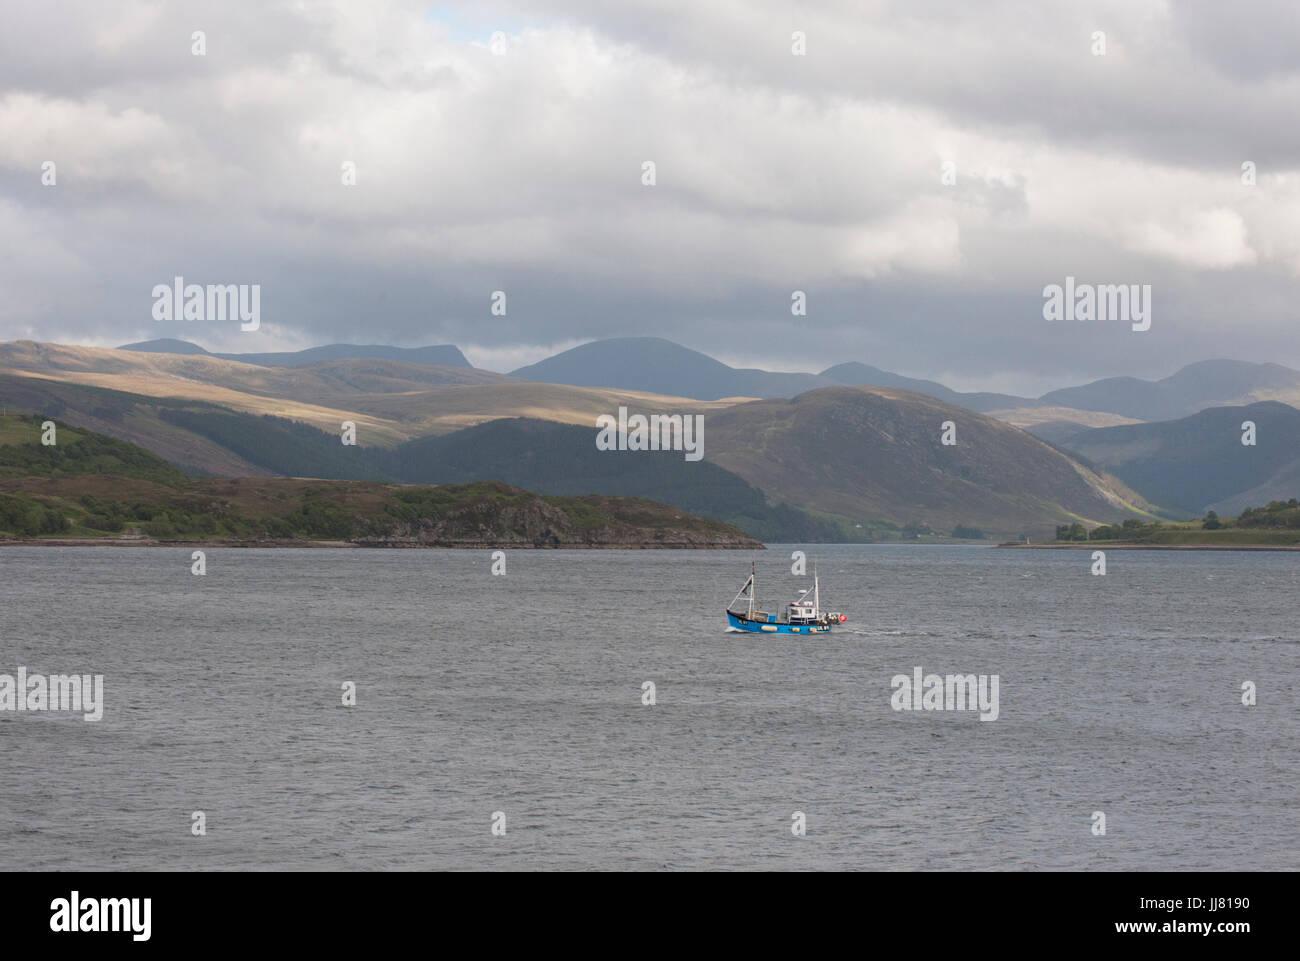 Fishing boat on Loch Broom, Ullapool, Ross-shire, Scottish Highlands, Scotland, United Kingdom - Stock Image